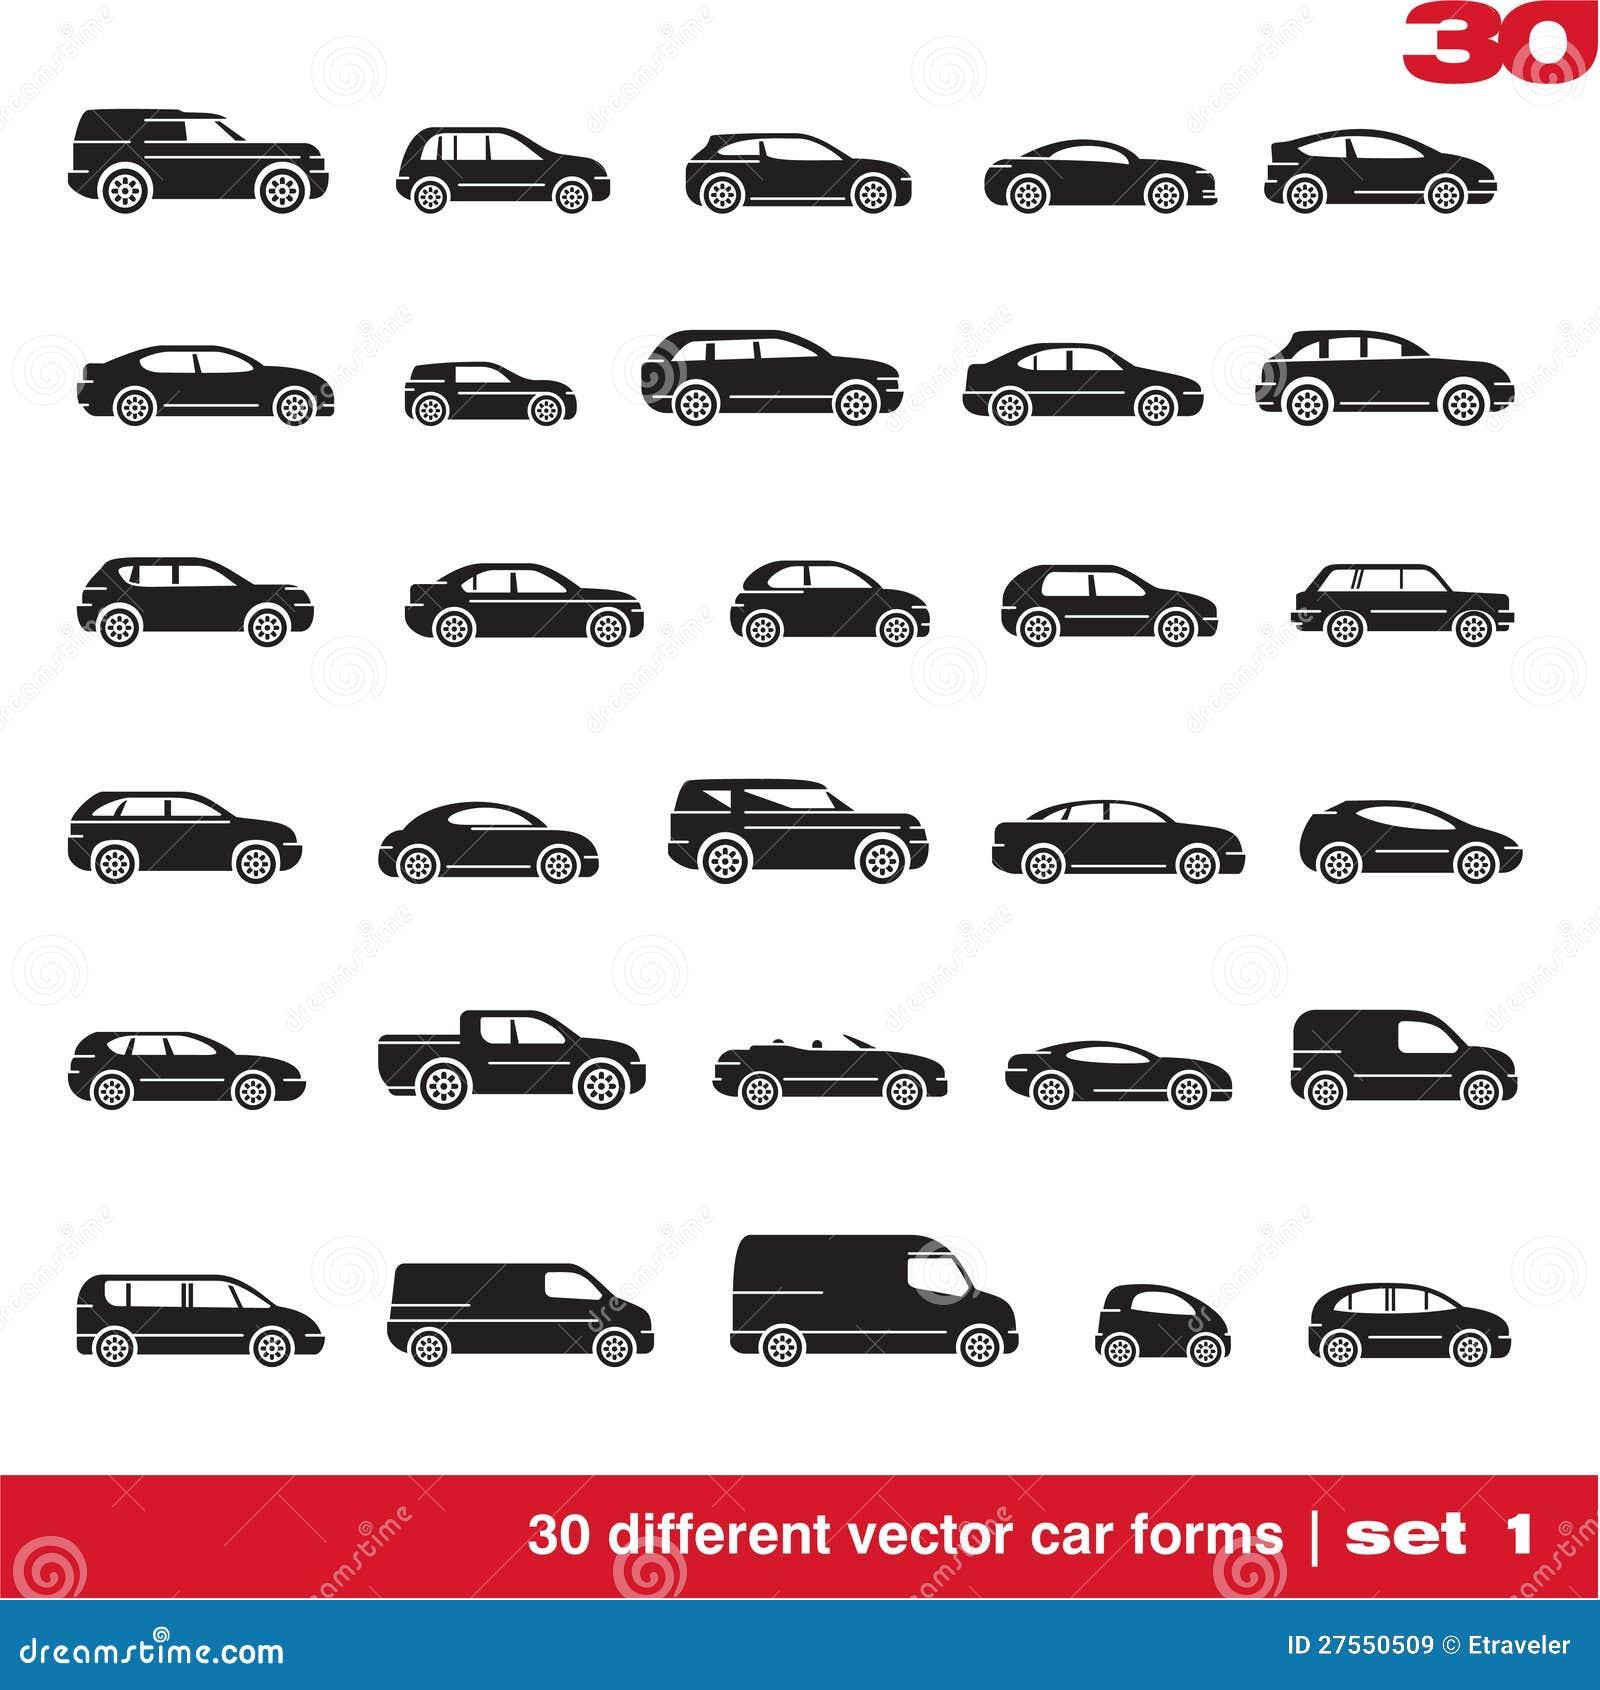 Cars icons set 1